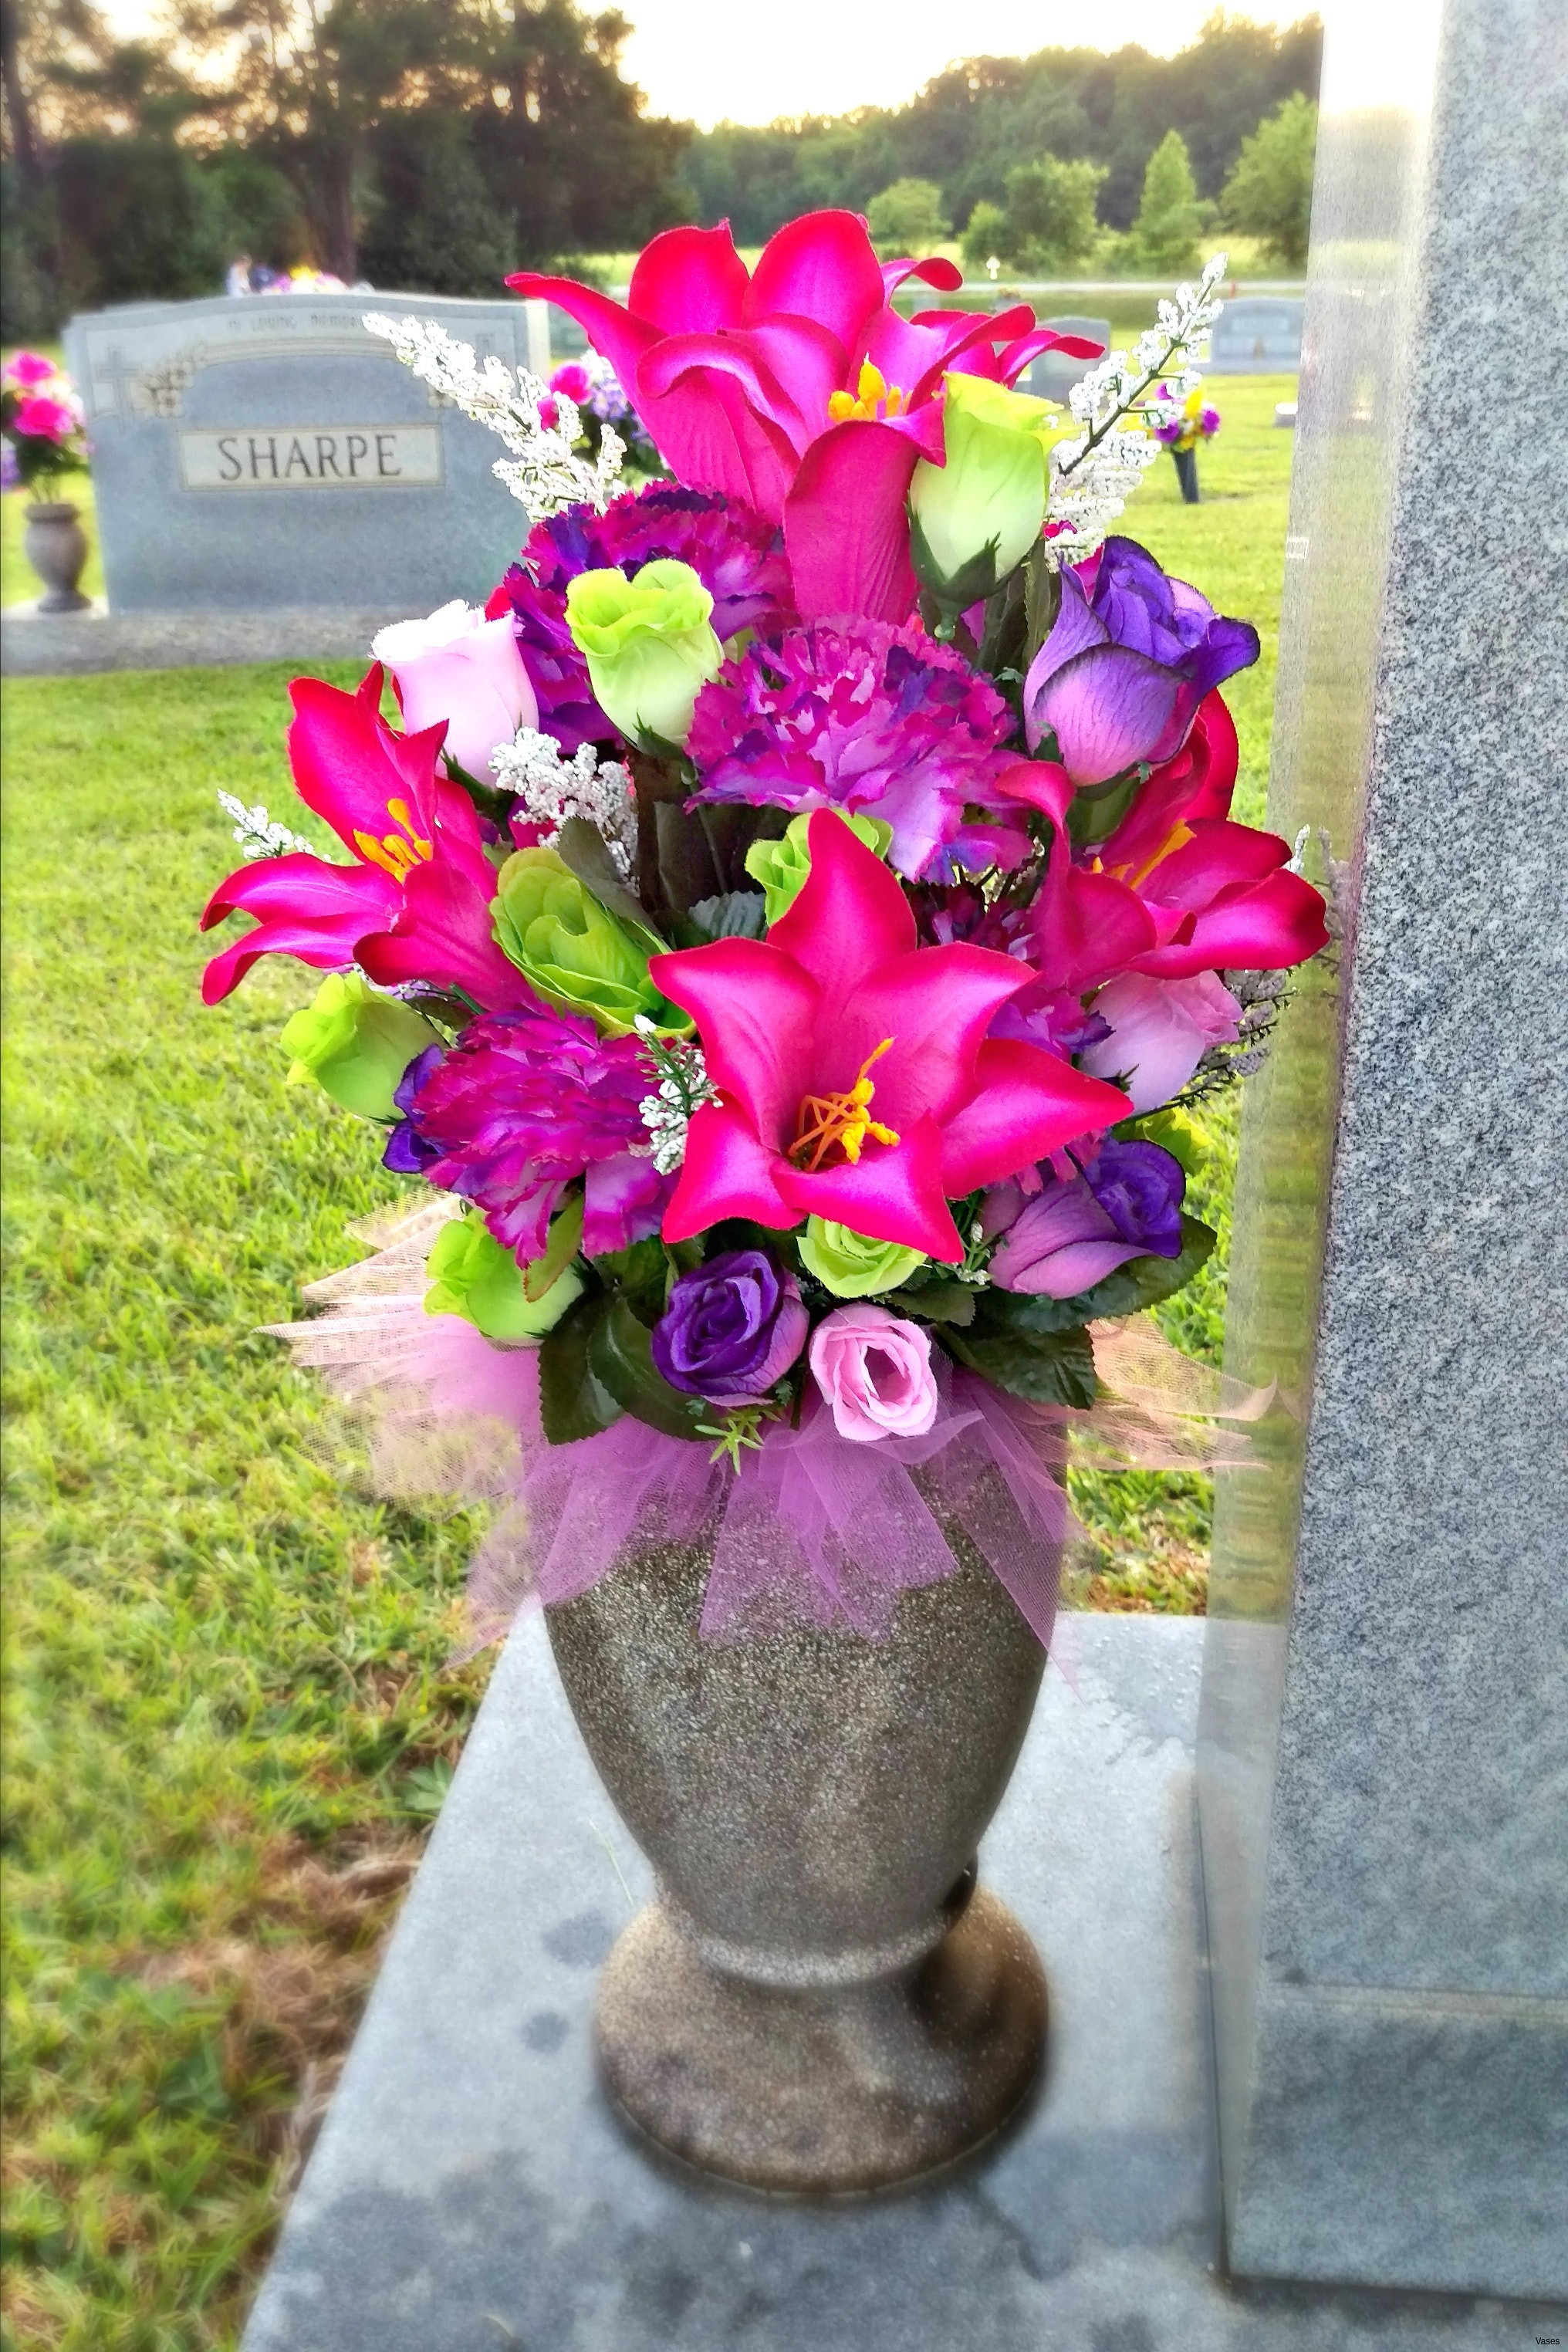 Headstone Vase Flower Arrangements Of In Ground Cemetery Vases Images Vases Grave Flower Vase Cemetery Pertaining to In Ground Cemetery Vases Images Vases Grave Flower Vase Cemetery Informationi 0d In Ground Holders Of